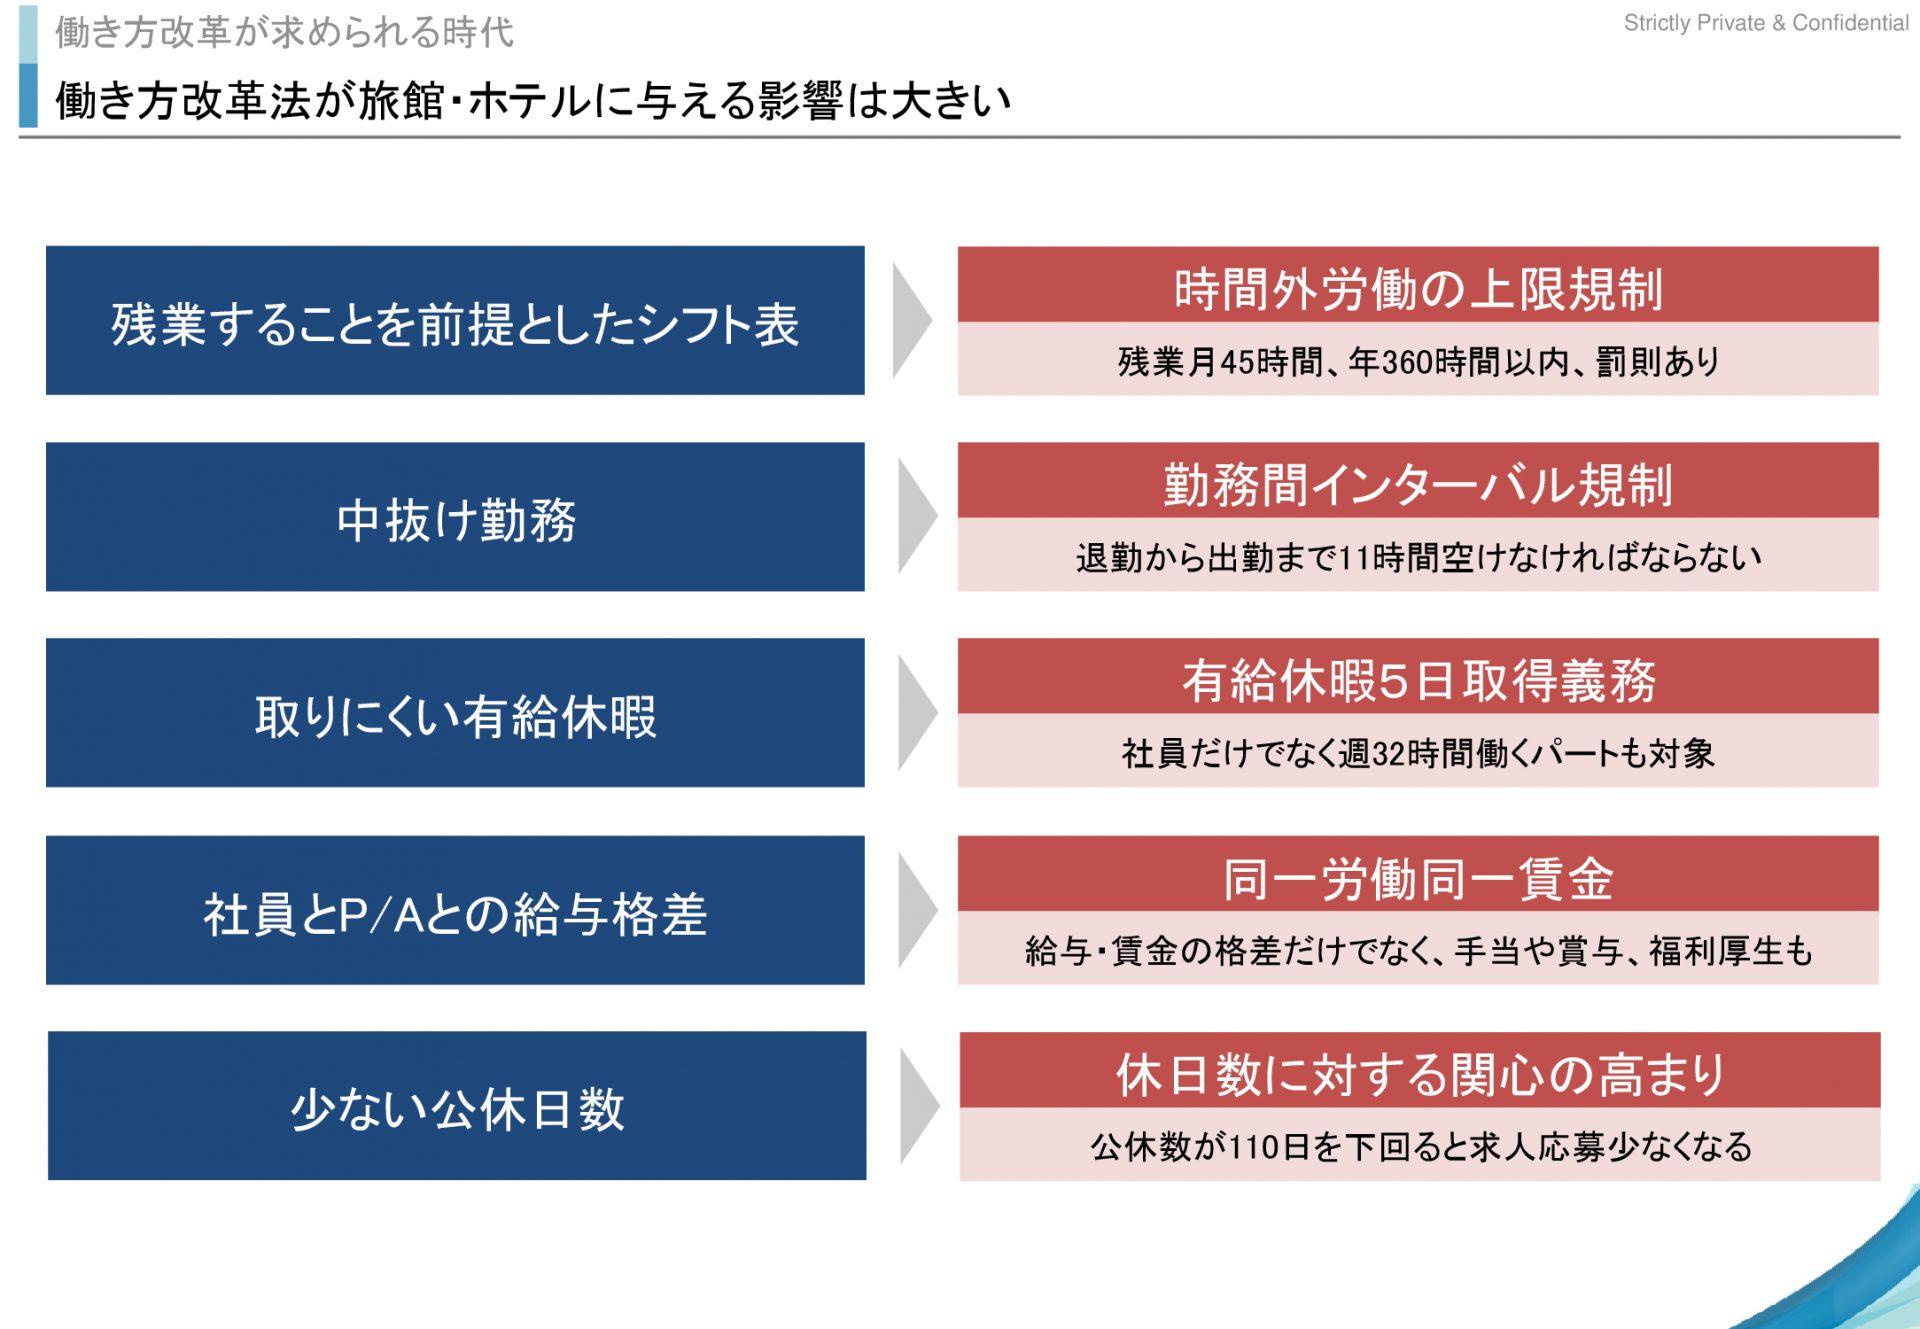 work-style-reform-of-hotel-ryokan